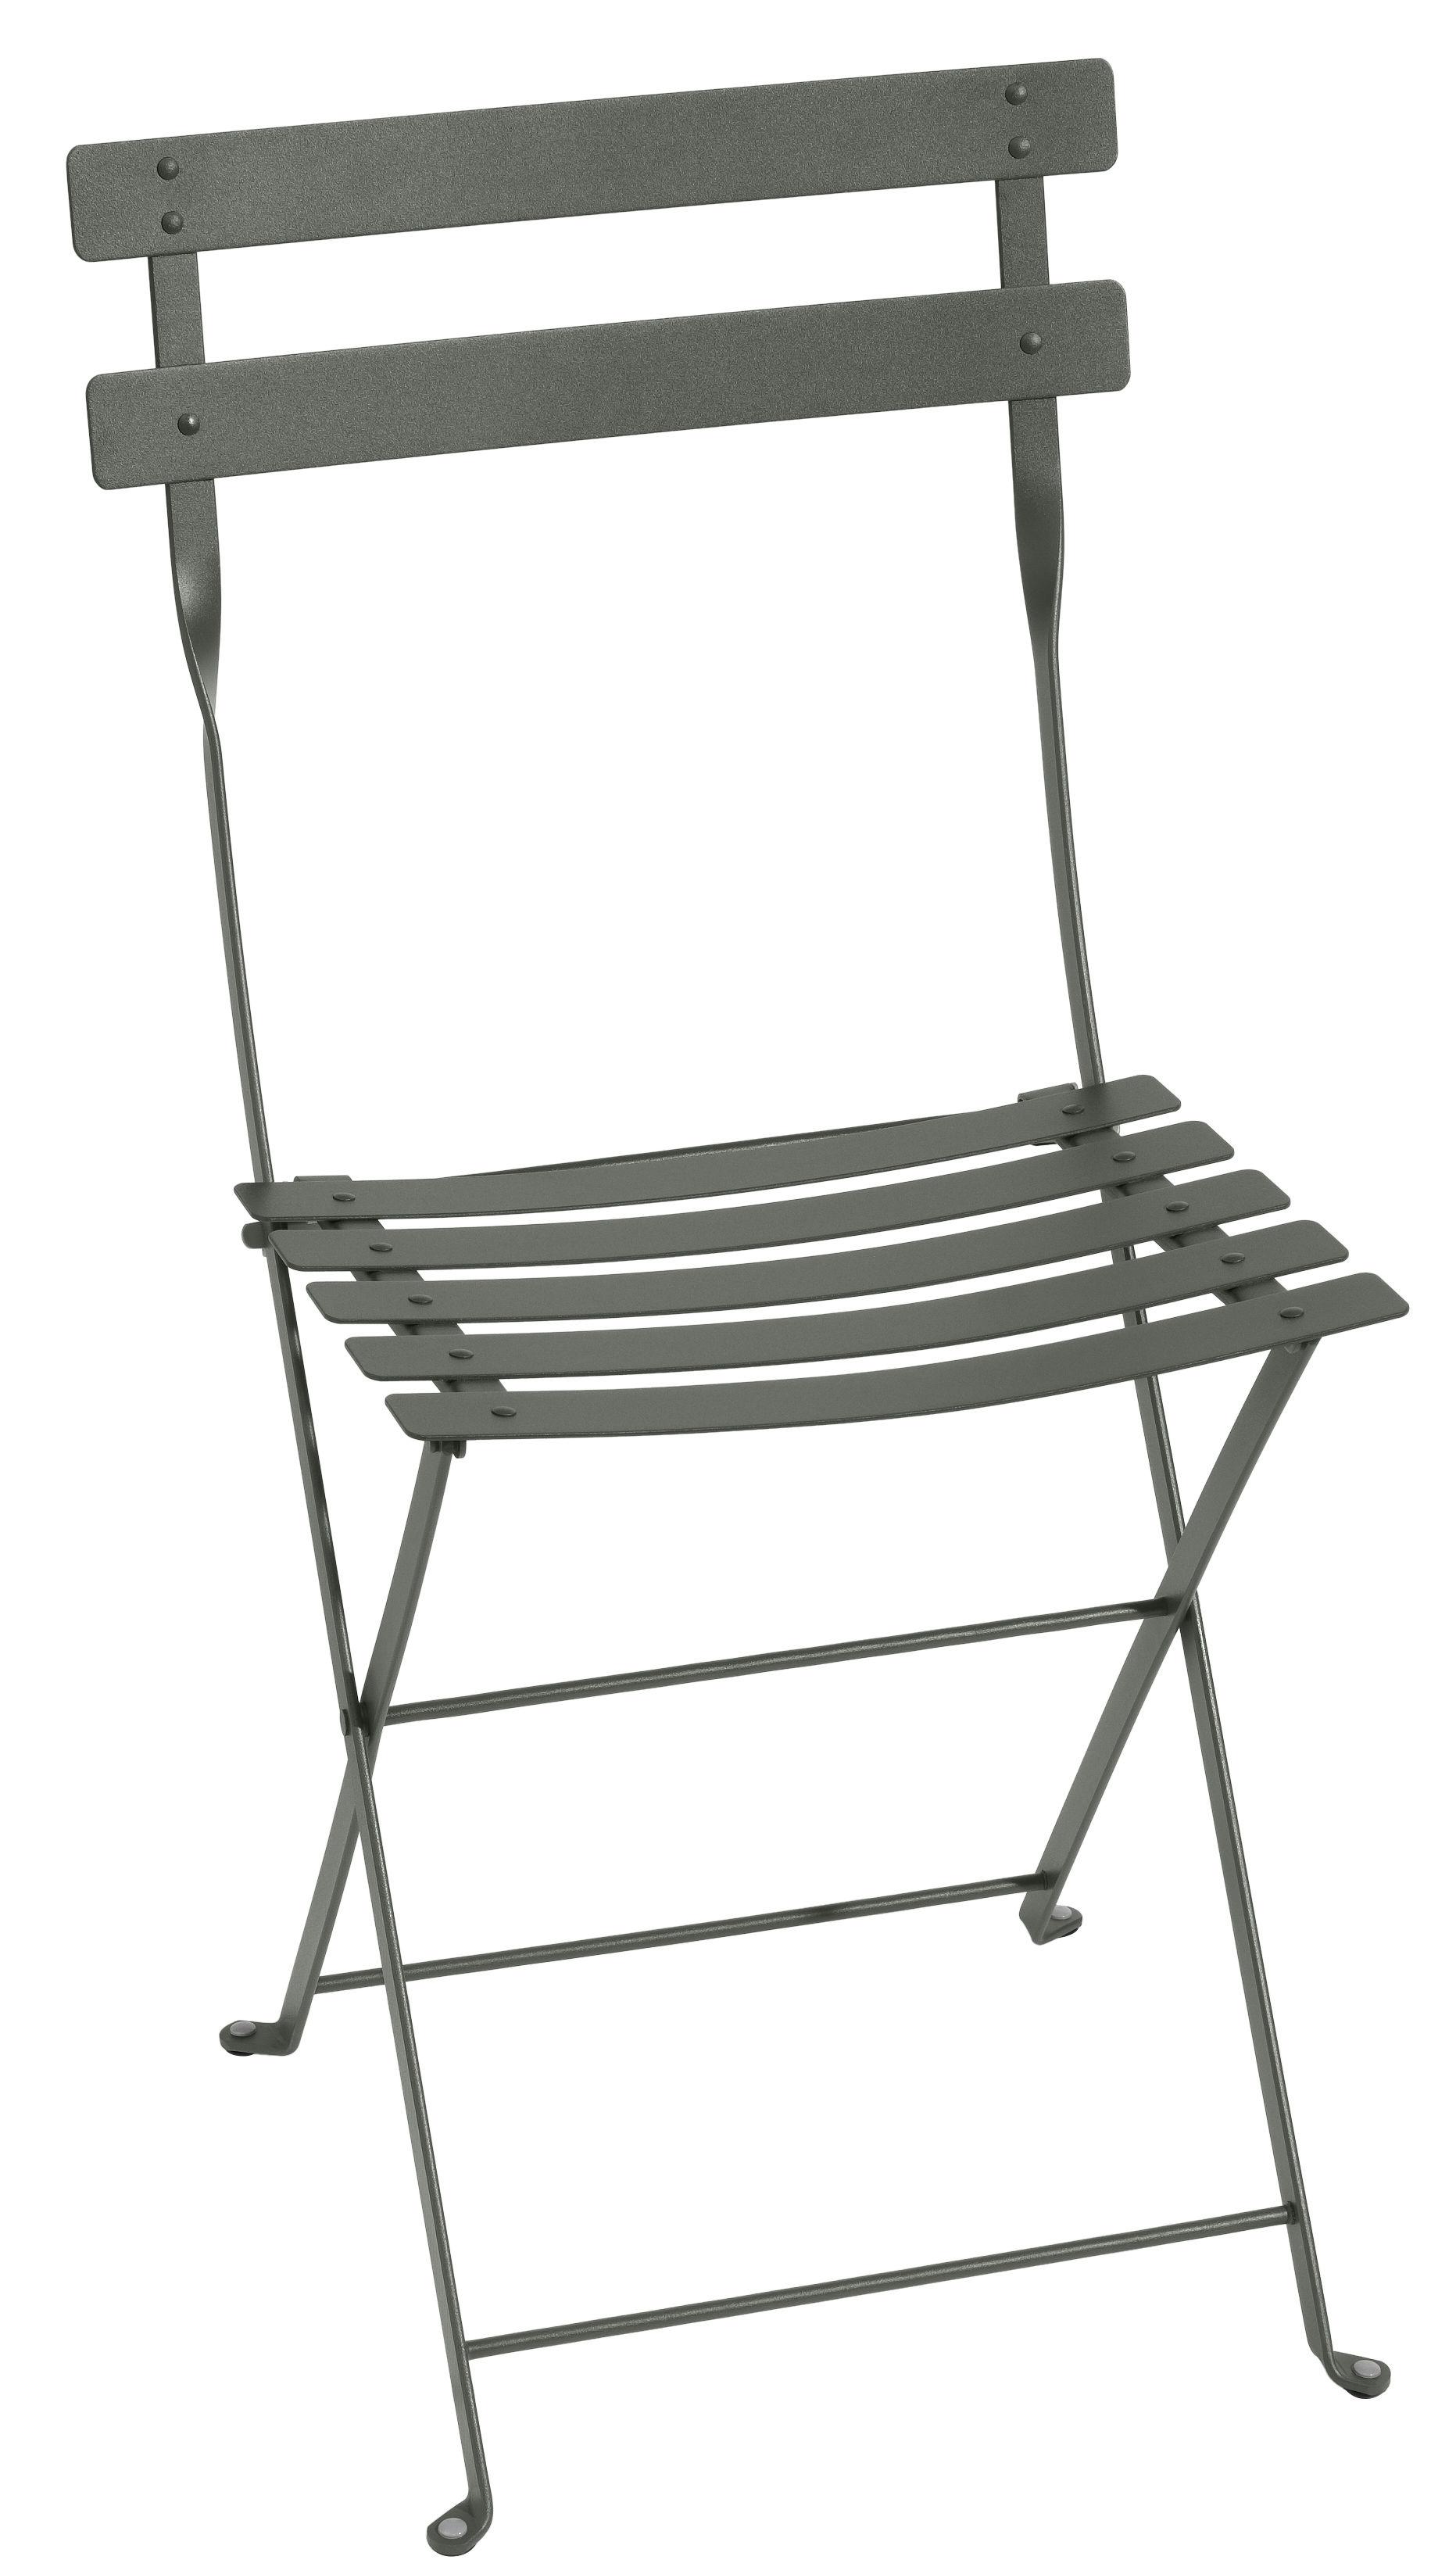 Möbel - Stühle  - Bistro Klappstuhl / Metall - Fermob - Rosmarin - lackierter Stahl